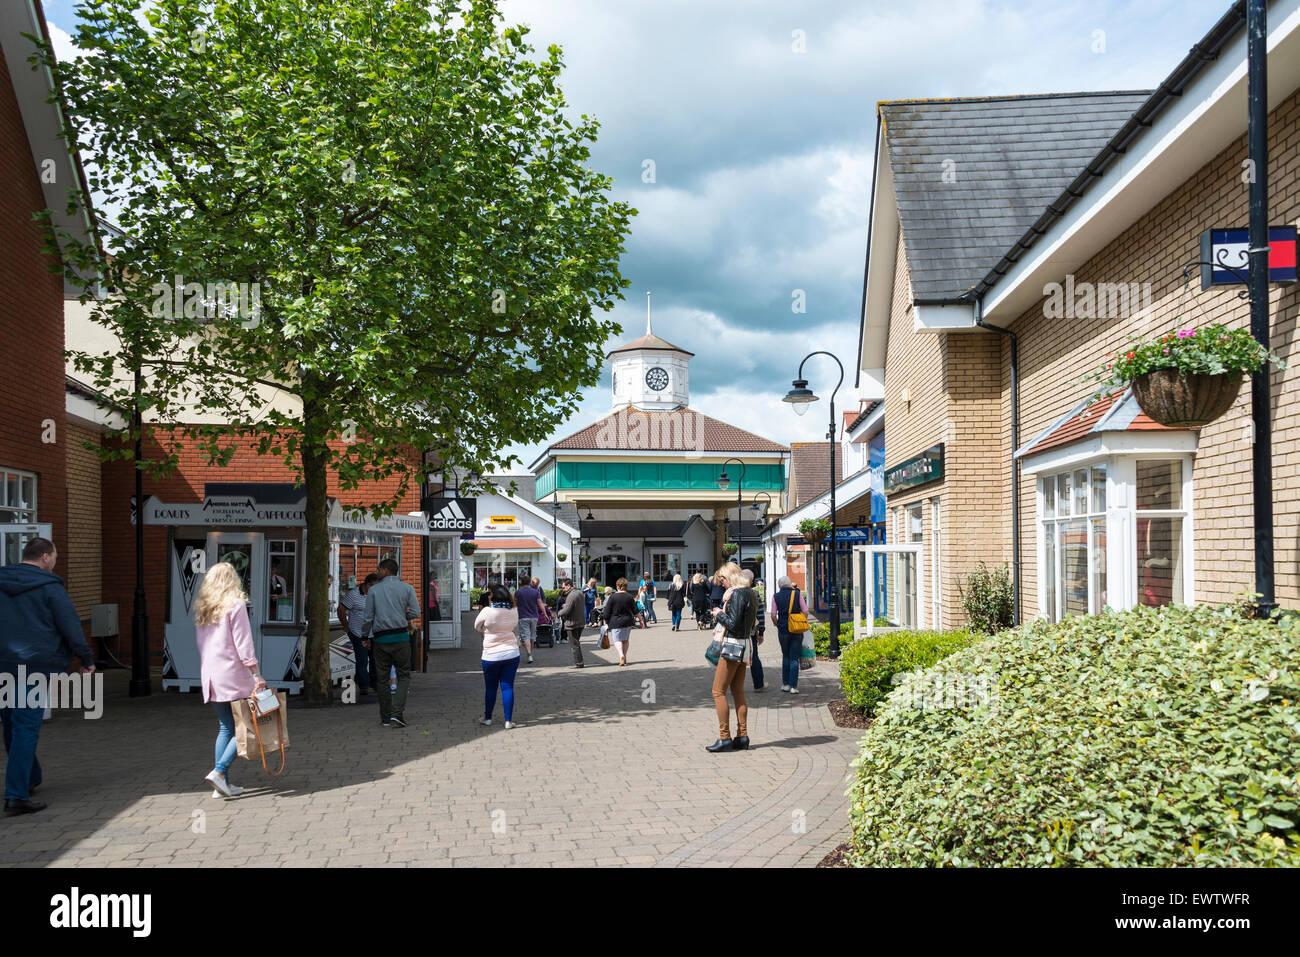 Freeport Braintree Outlet Shopping Village, Braintree, Essex, England, United Kingdom - Stock Image